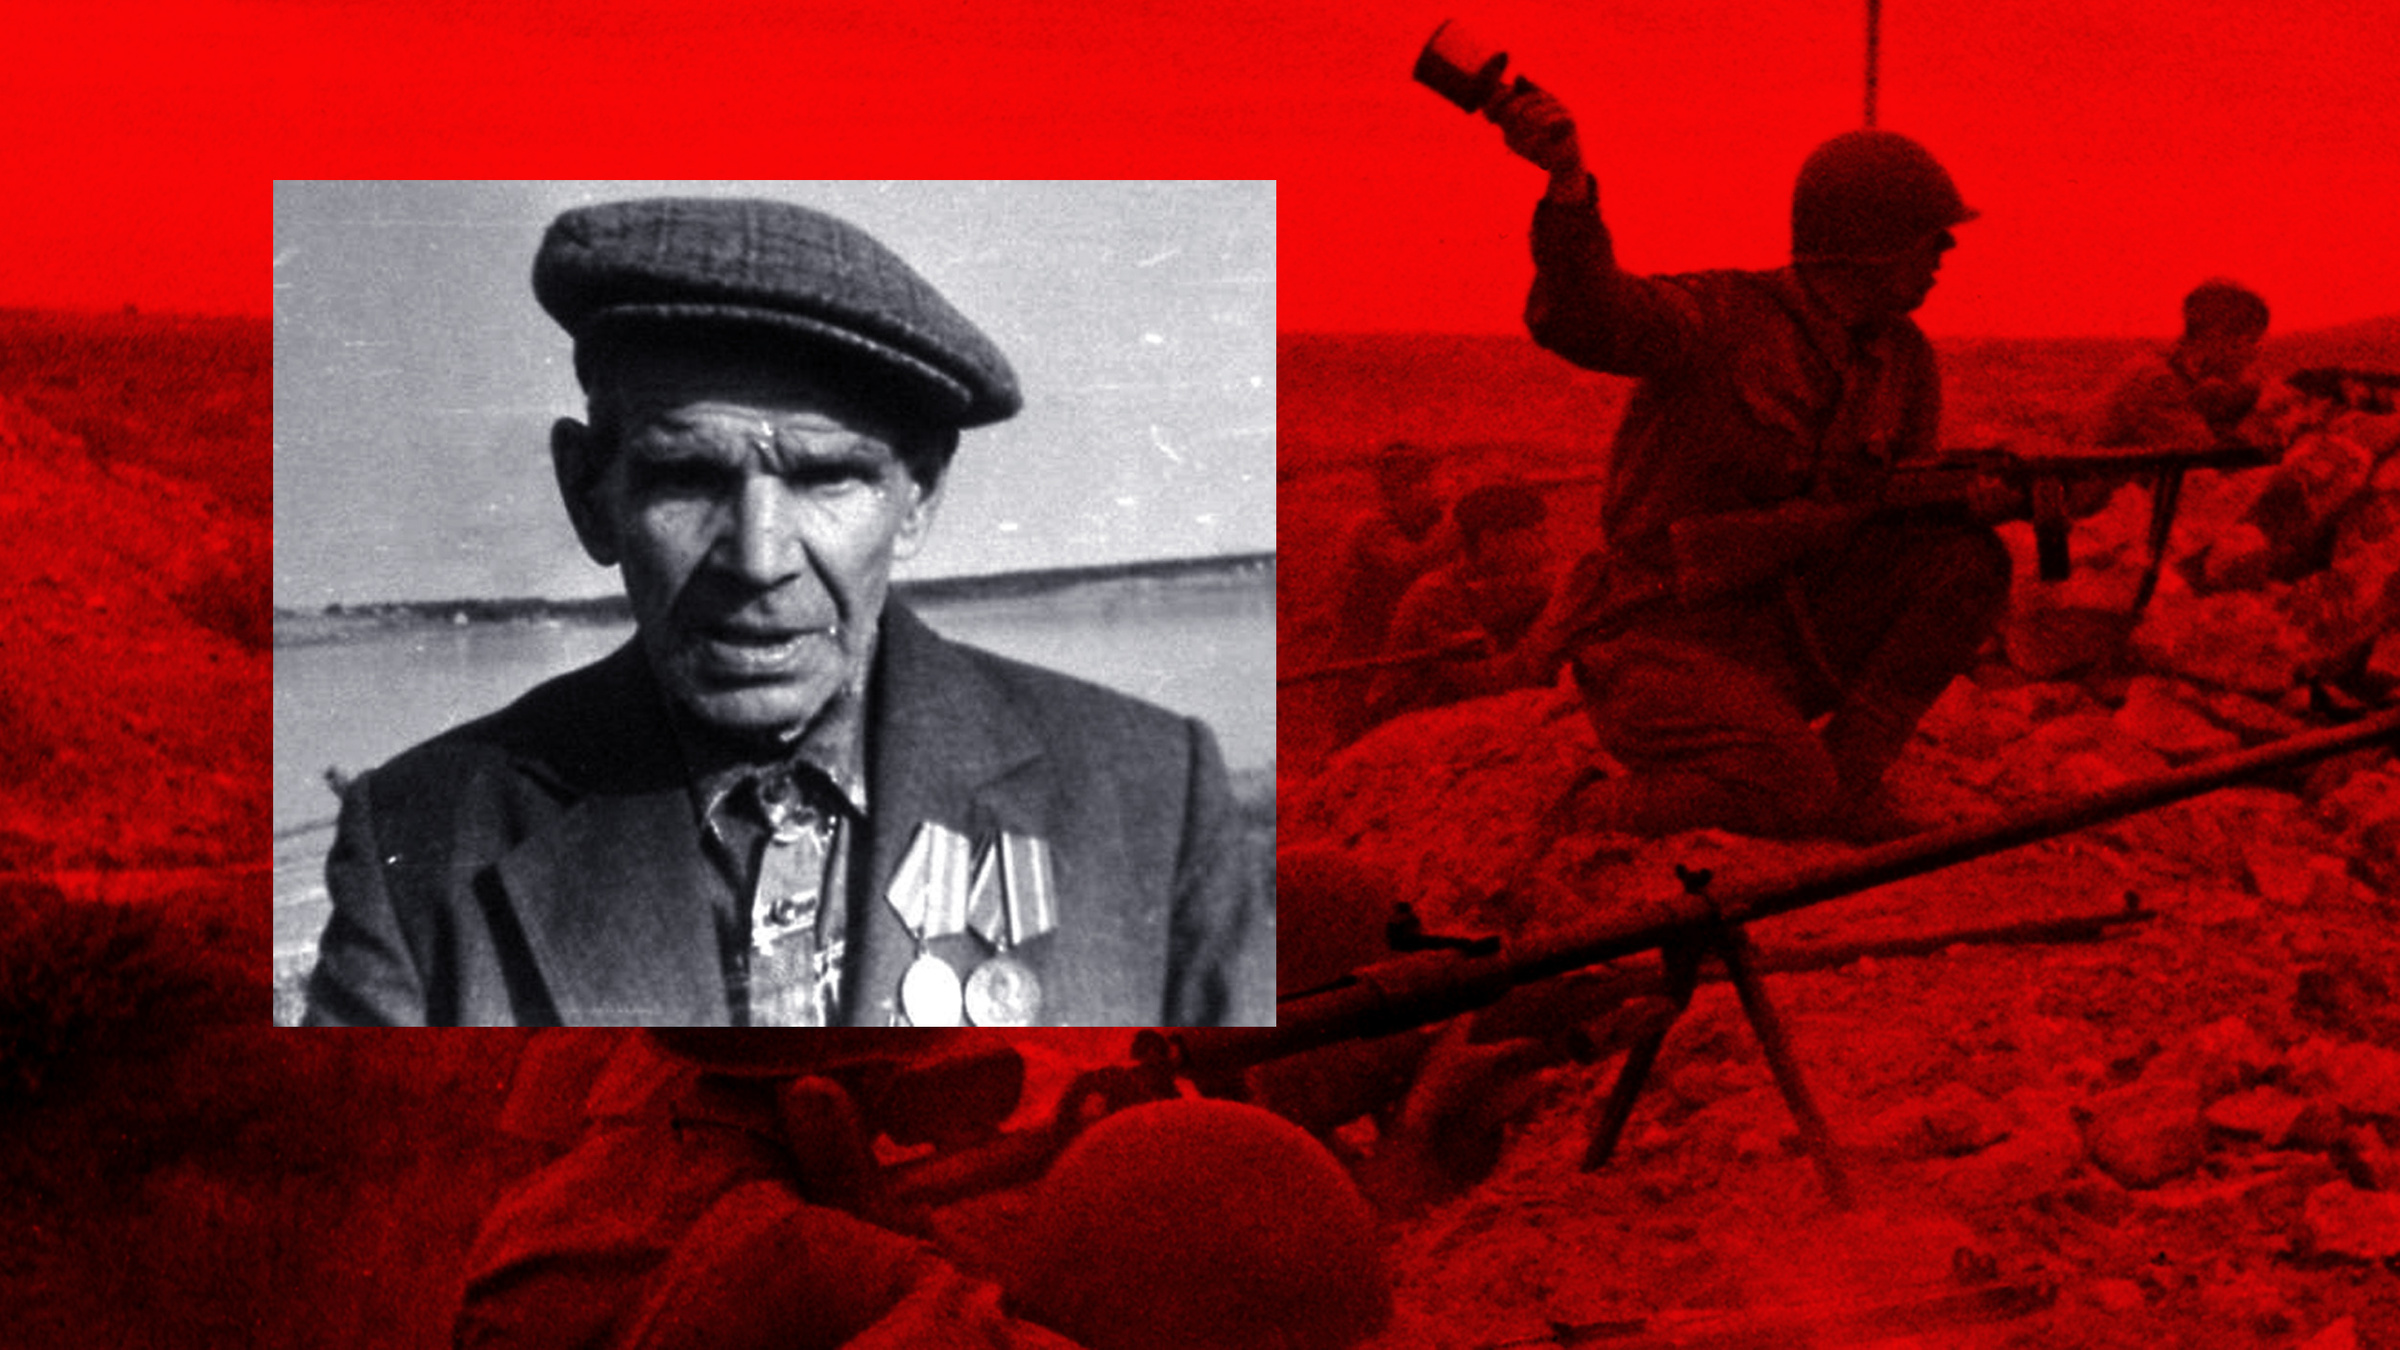 "<p>Коллаж© LIFE. Фото ©ТАСС / Евзерихин Эммануил, © <a href=""https://voenhronika.ru/publ/vtoraja_mirovaja_vojna_sssr_khronika/posle_vojny_veteran_vstretil_karatelja_na_pochte_vysledil_i_otomstil_krasnoarmejcy_iz_jarcevskogo_lagerja_peredajut_tebe_privet_2020/22-1-0-7058"" target=""_blank"" rel=""noopener noreferrer"">voenhronika.ru</a></p>"